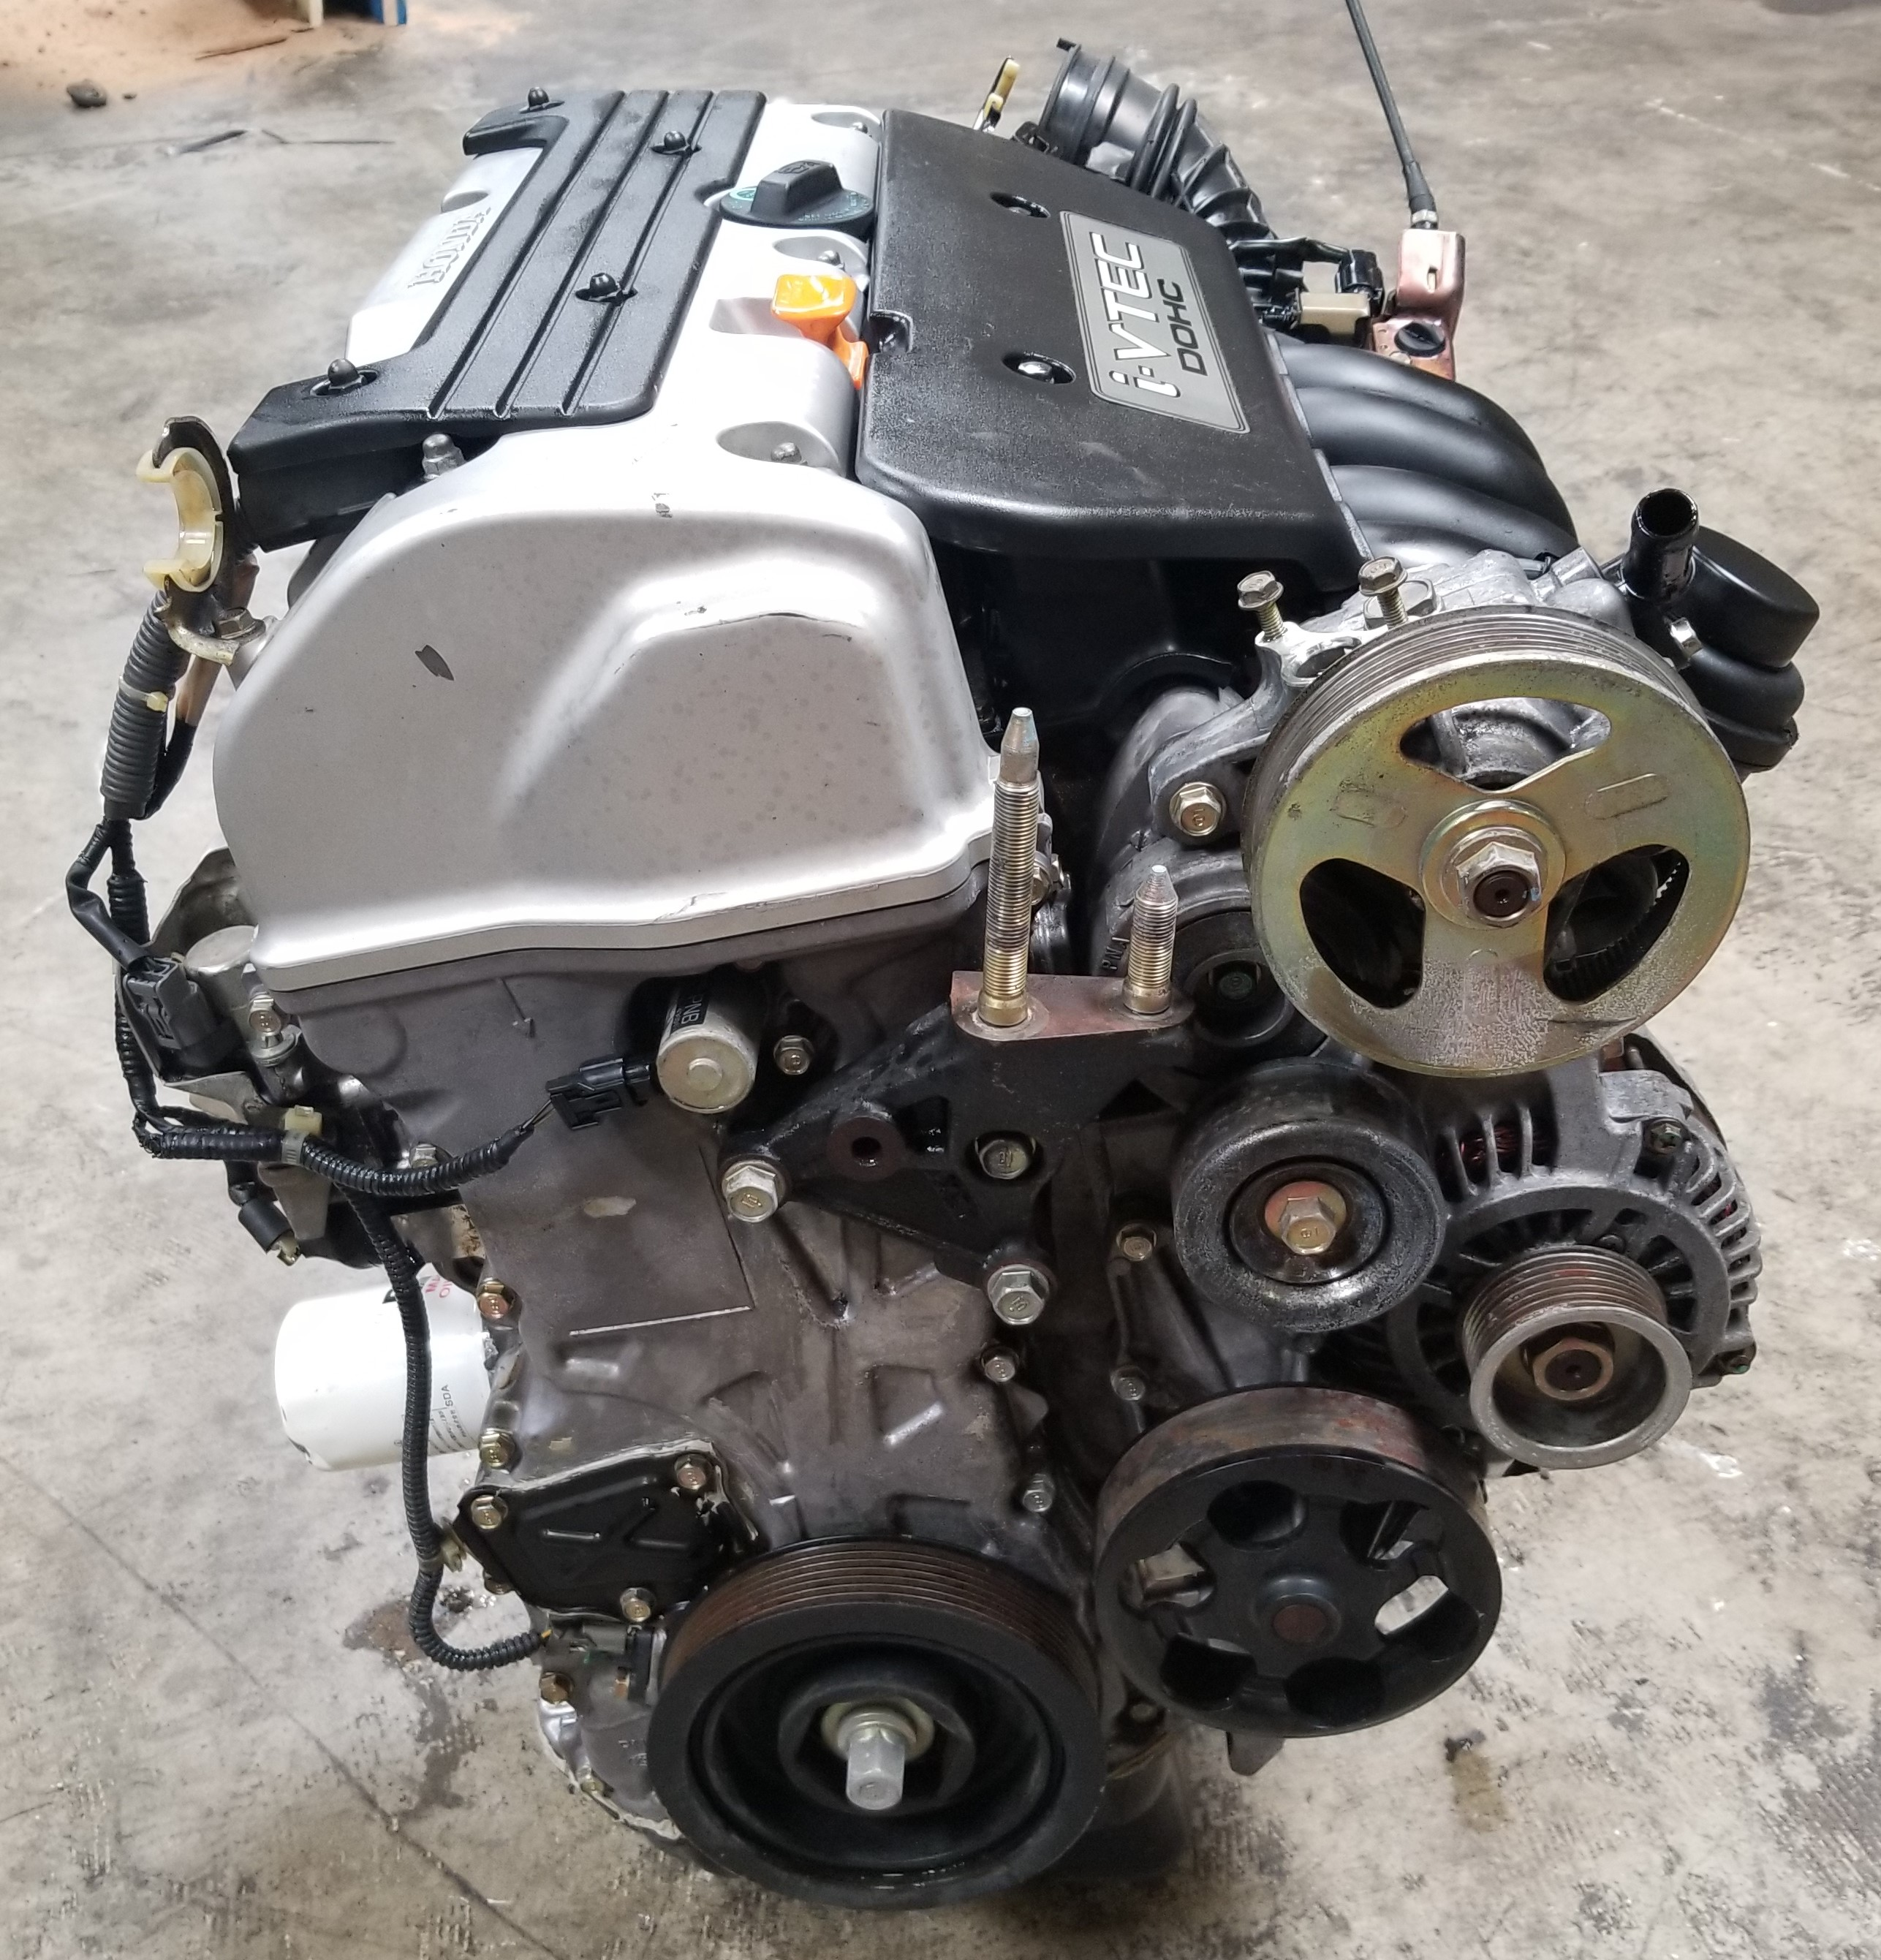 Nissan Chula Vista >> K20 2002-2006 ACURA RSX BASE CIVIC SI 2.0 ENGINE JDM K20A K20 K20A3 | JDM Of San Diego